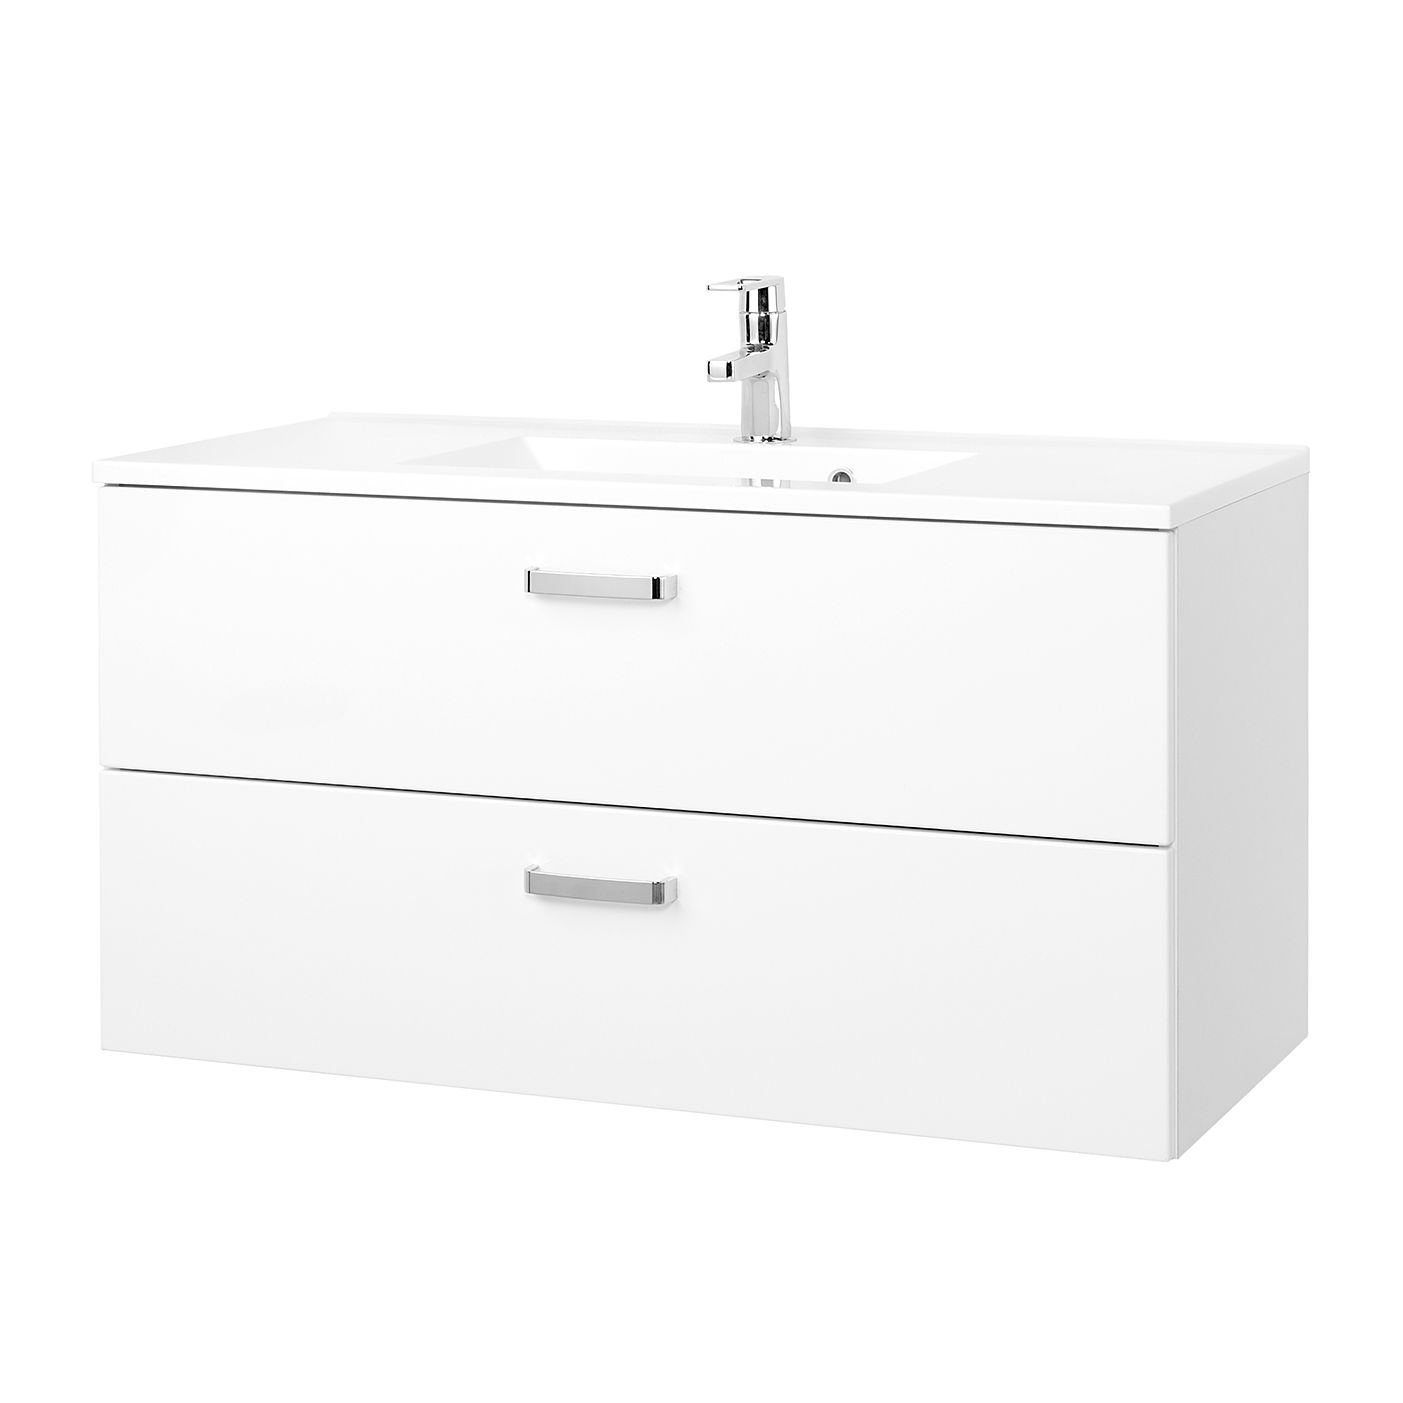 Mobile lavabo Zeehan - Bianco - 100 cm, Giessbach